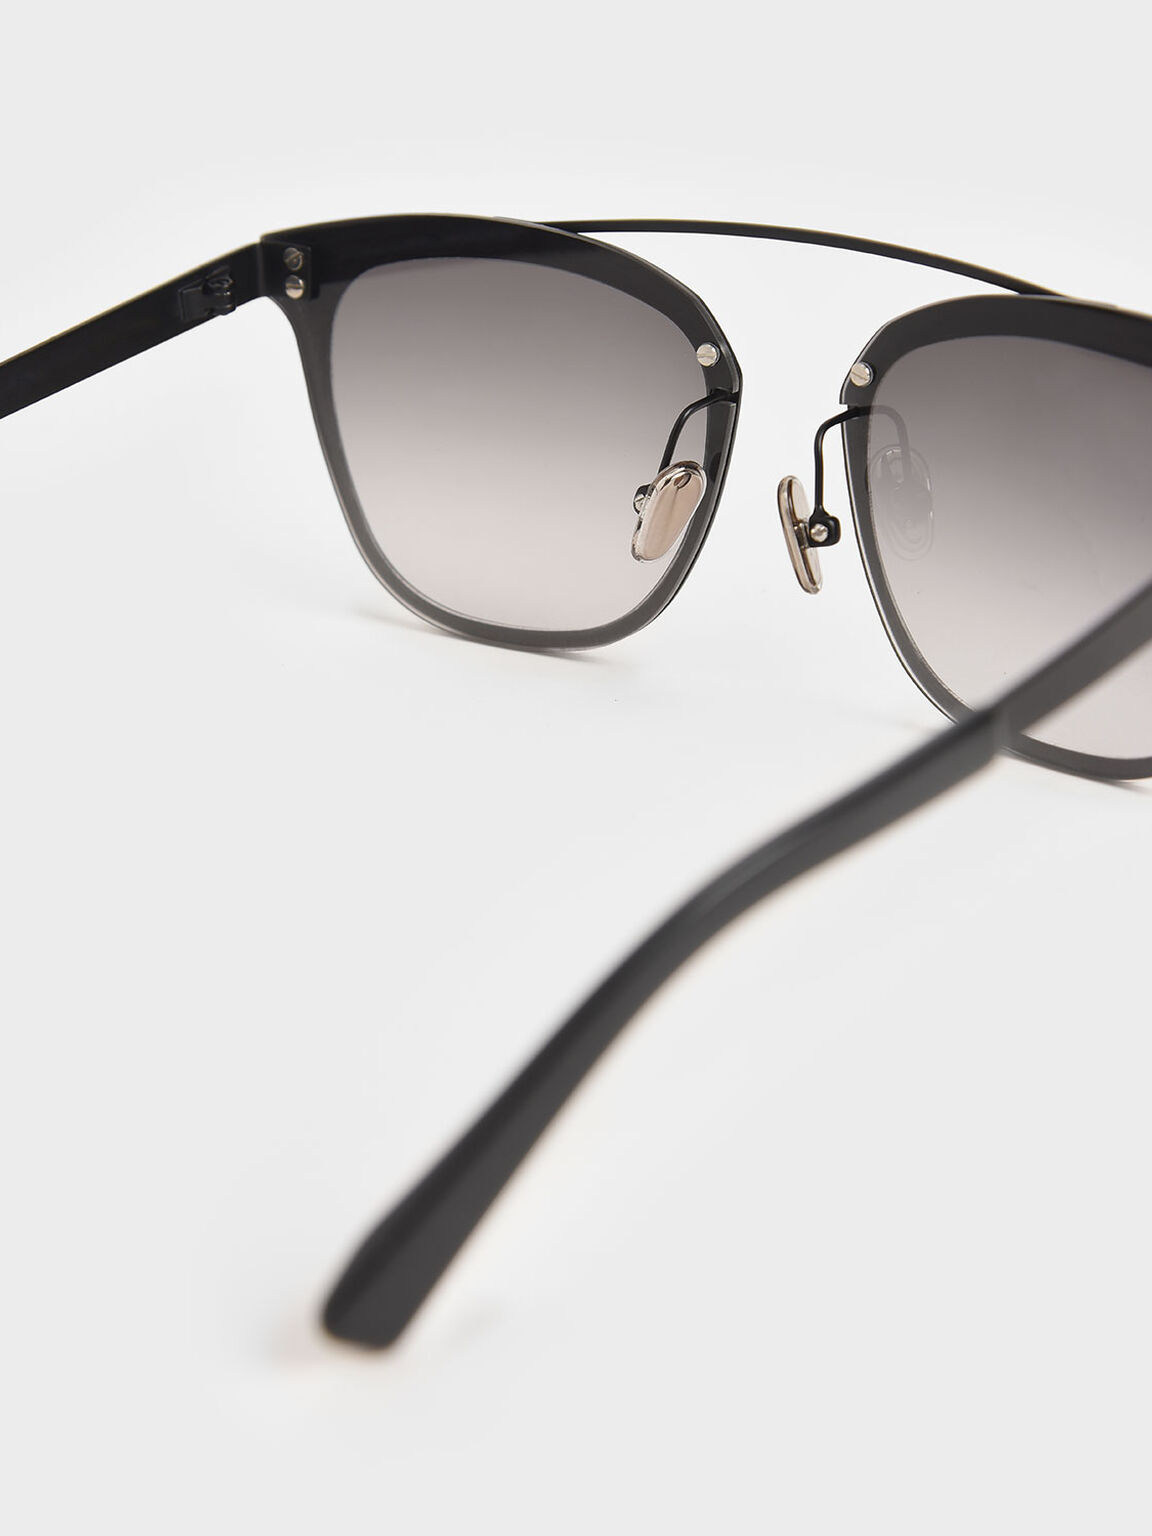 Metal Frame Sunglasses, Black, hi-res